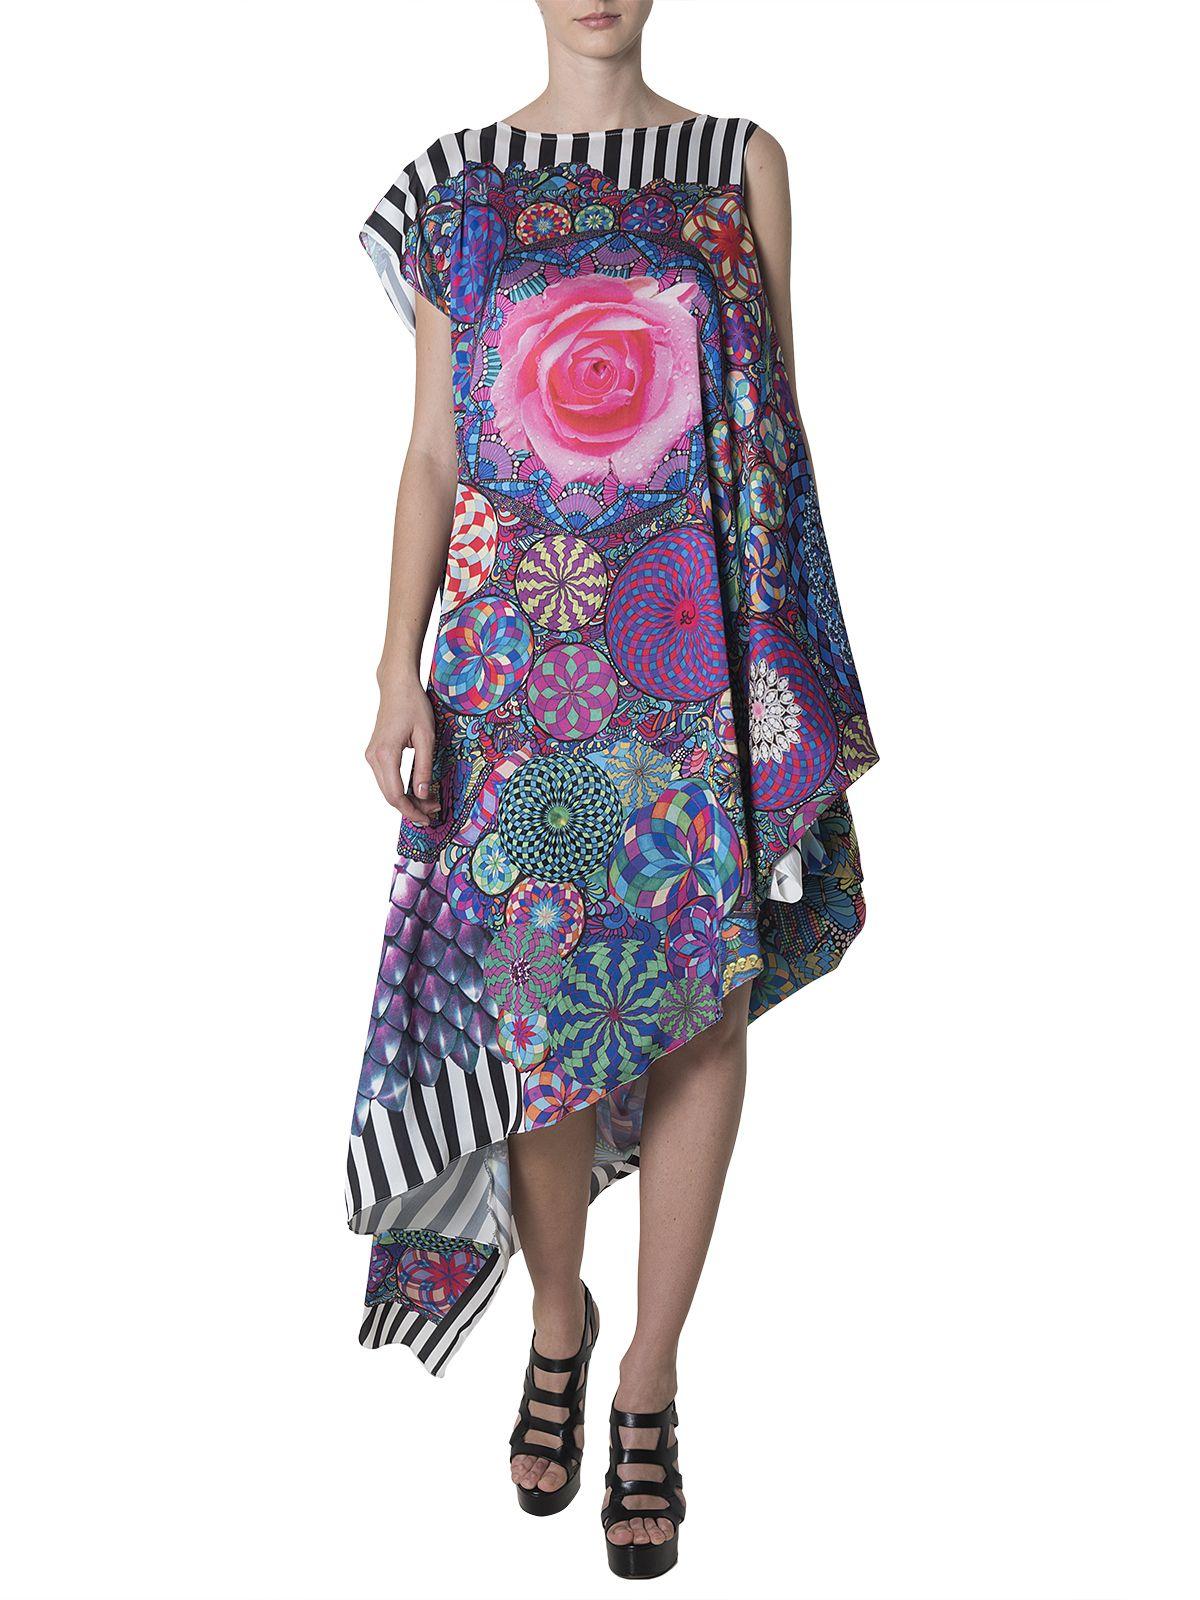 Sandragalan asymmetrical glam psy dress fashionprint inspired